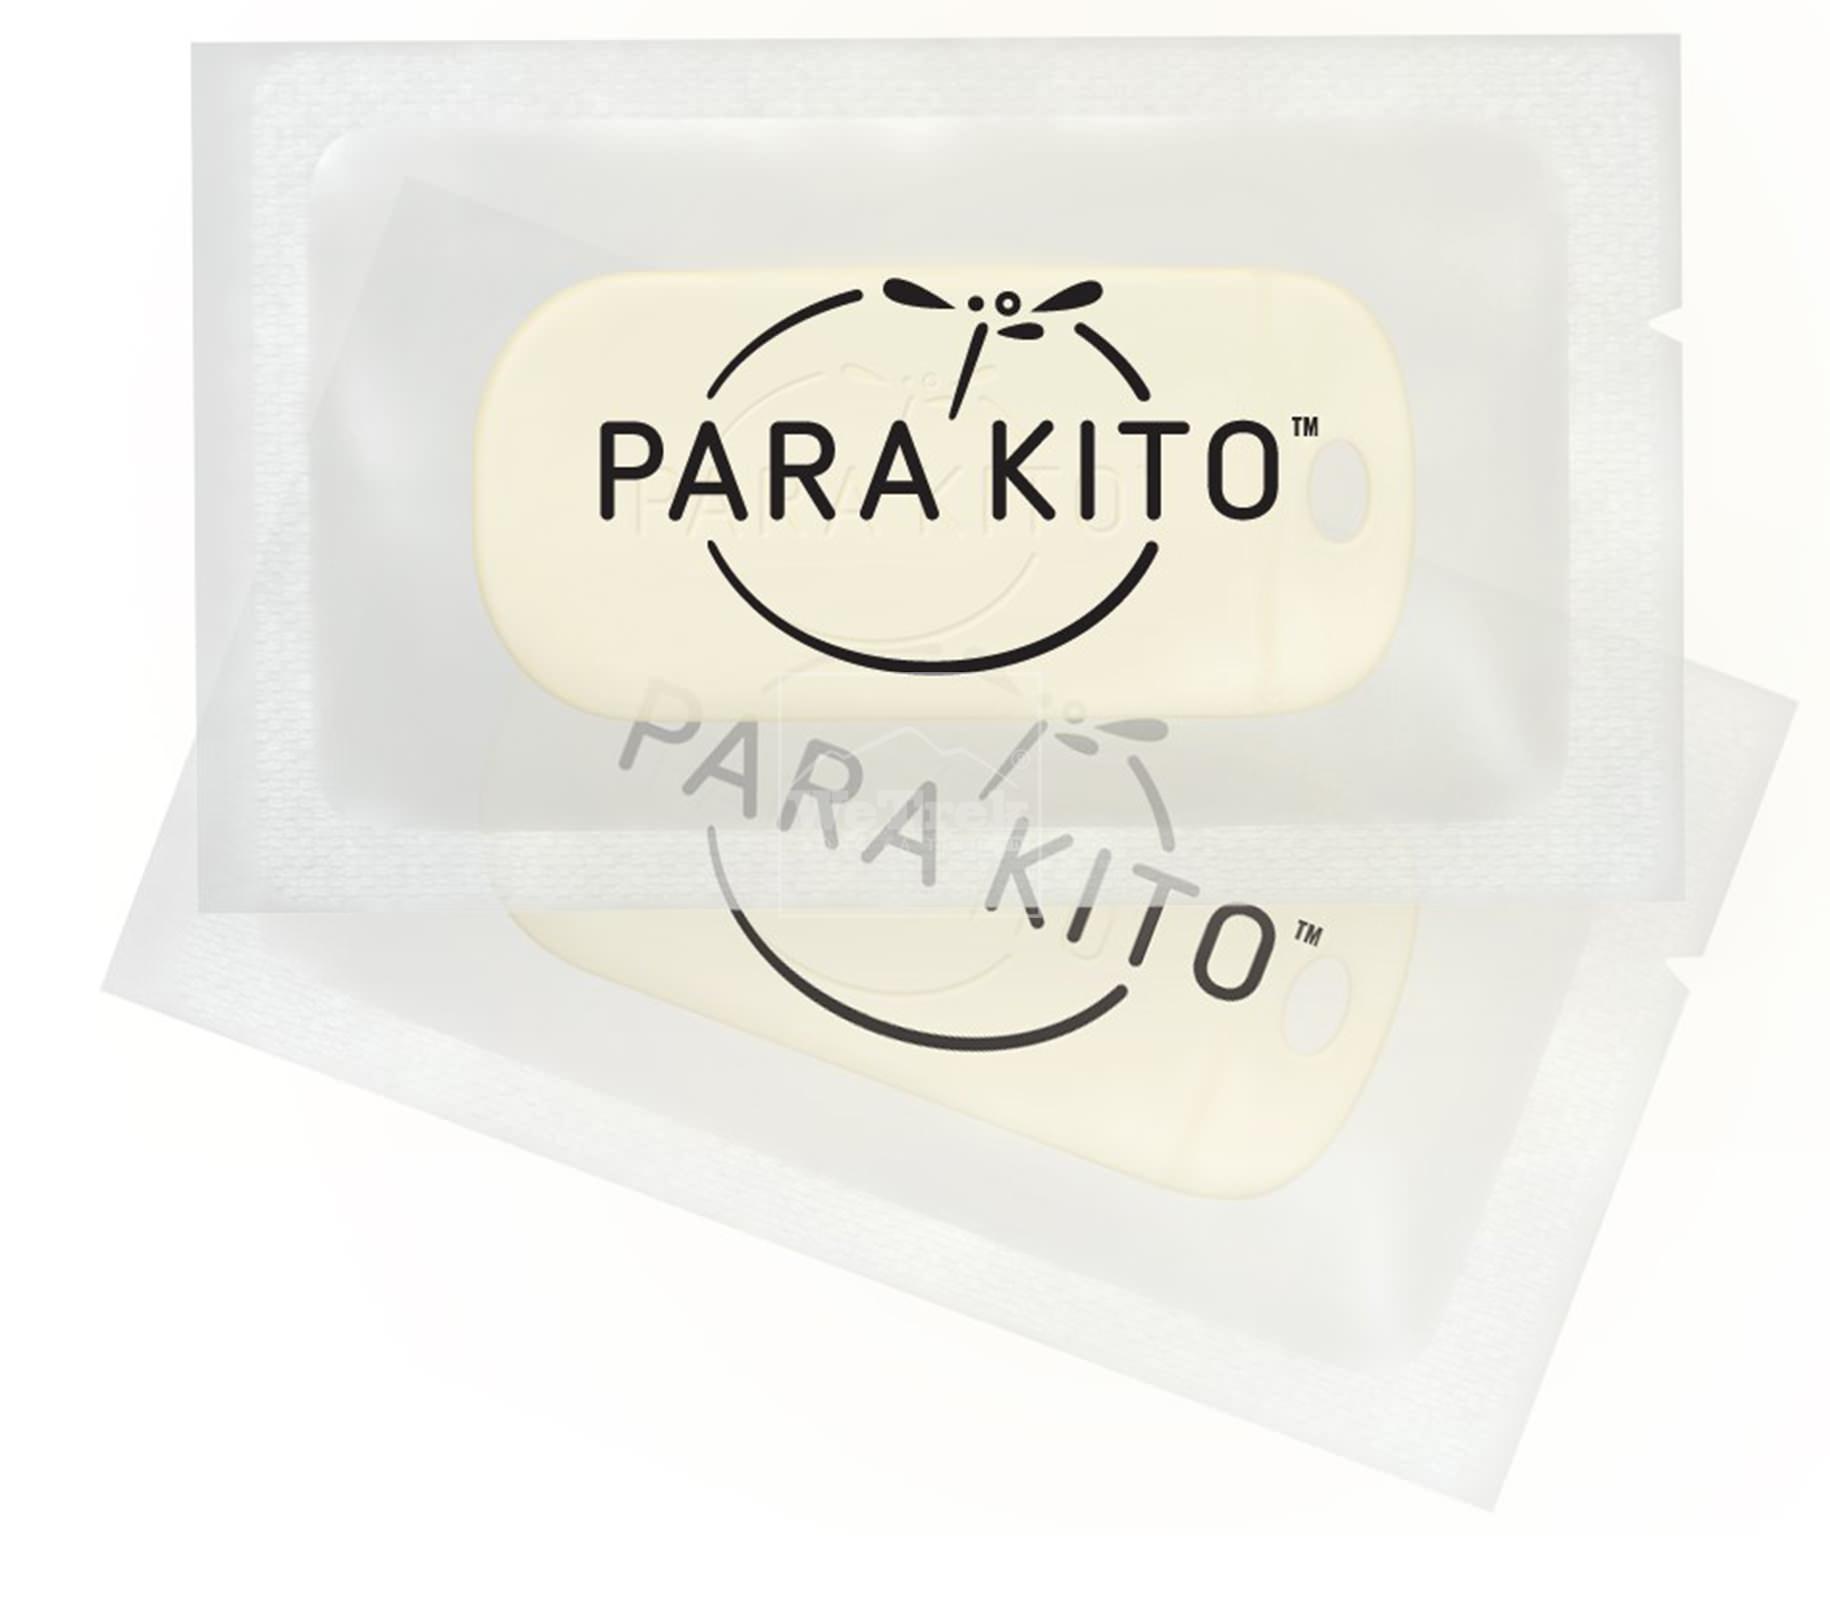 vien-chong-muoi-kem-moc-cài-parakito-black-clip-7650-wetrek.vn-2